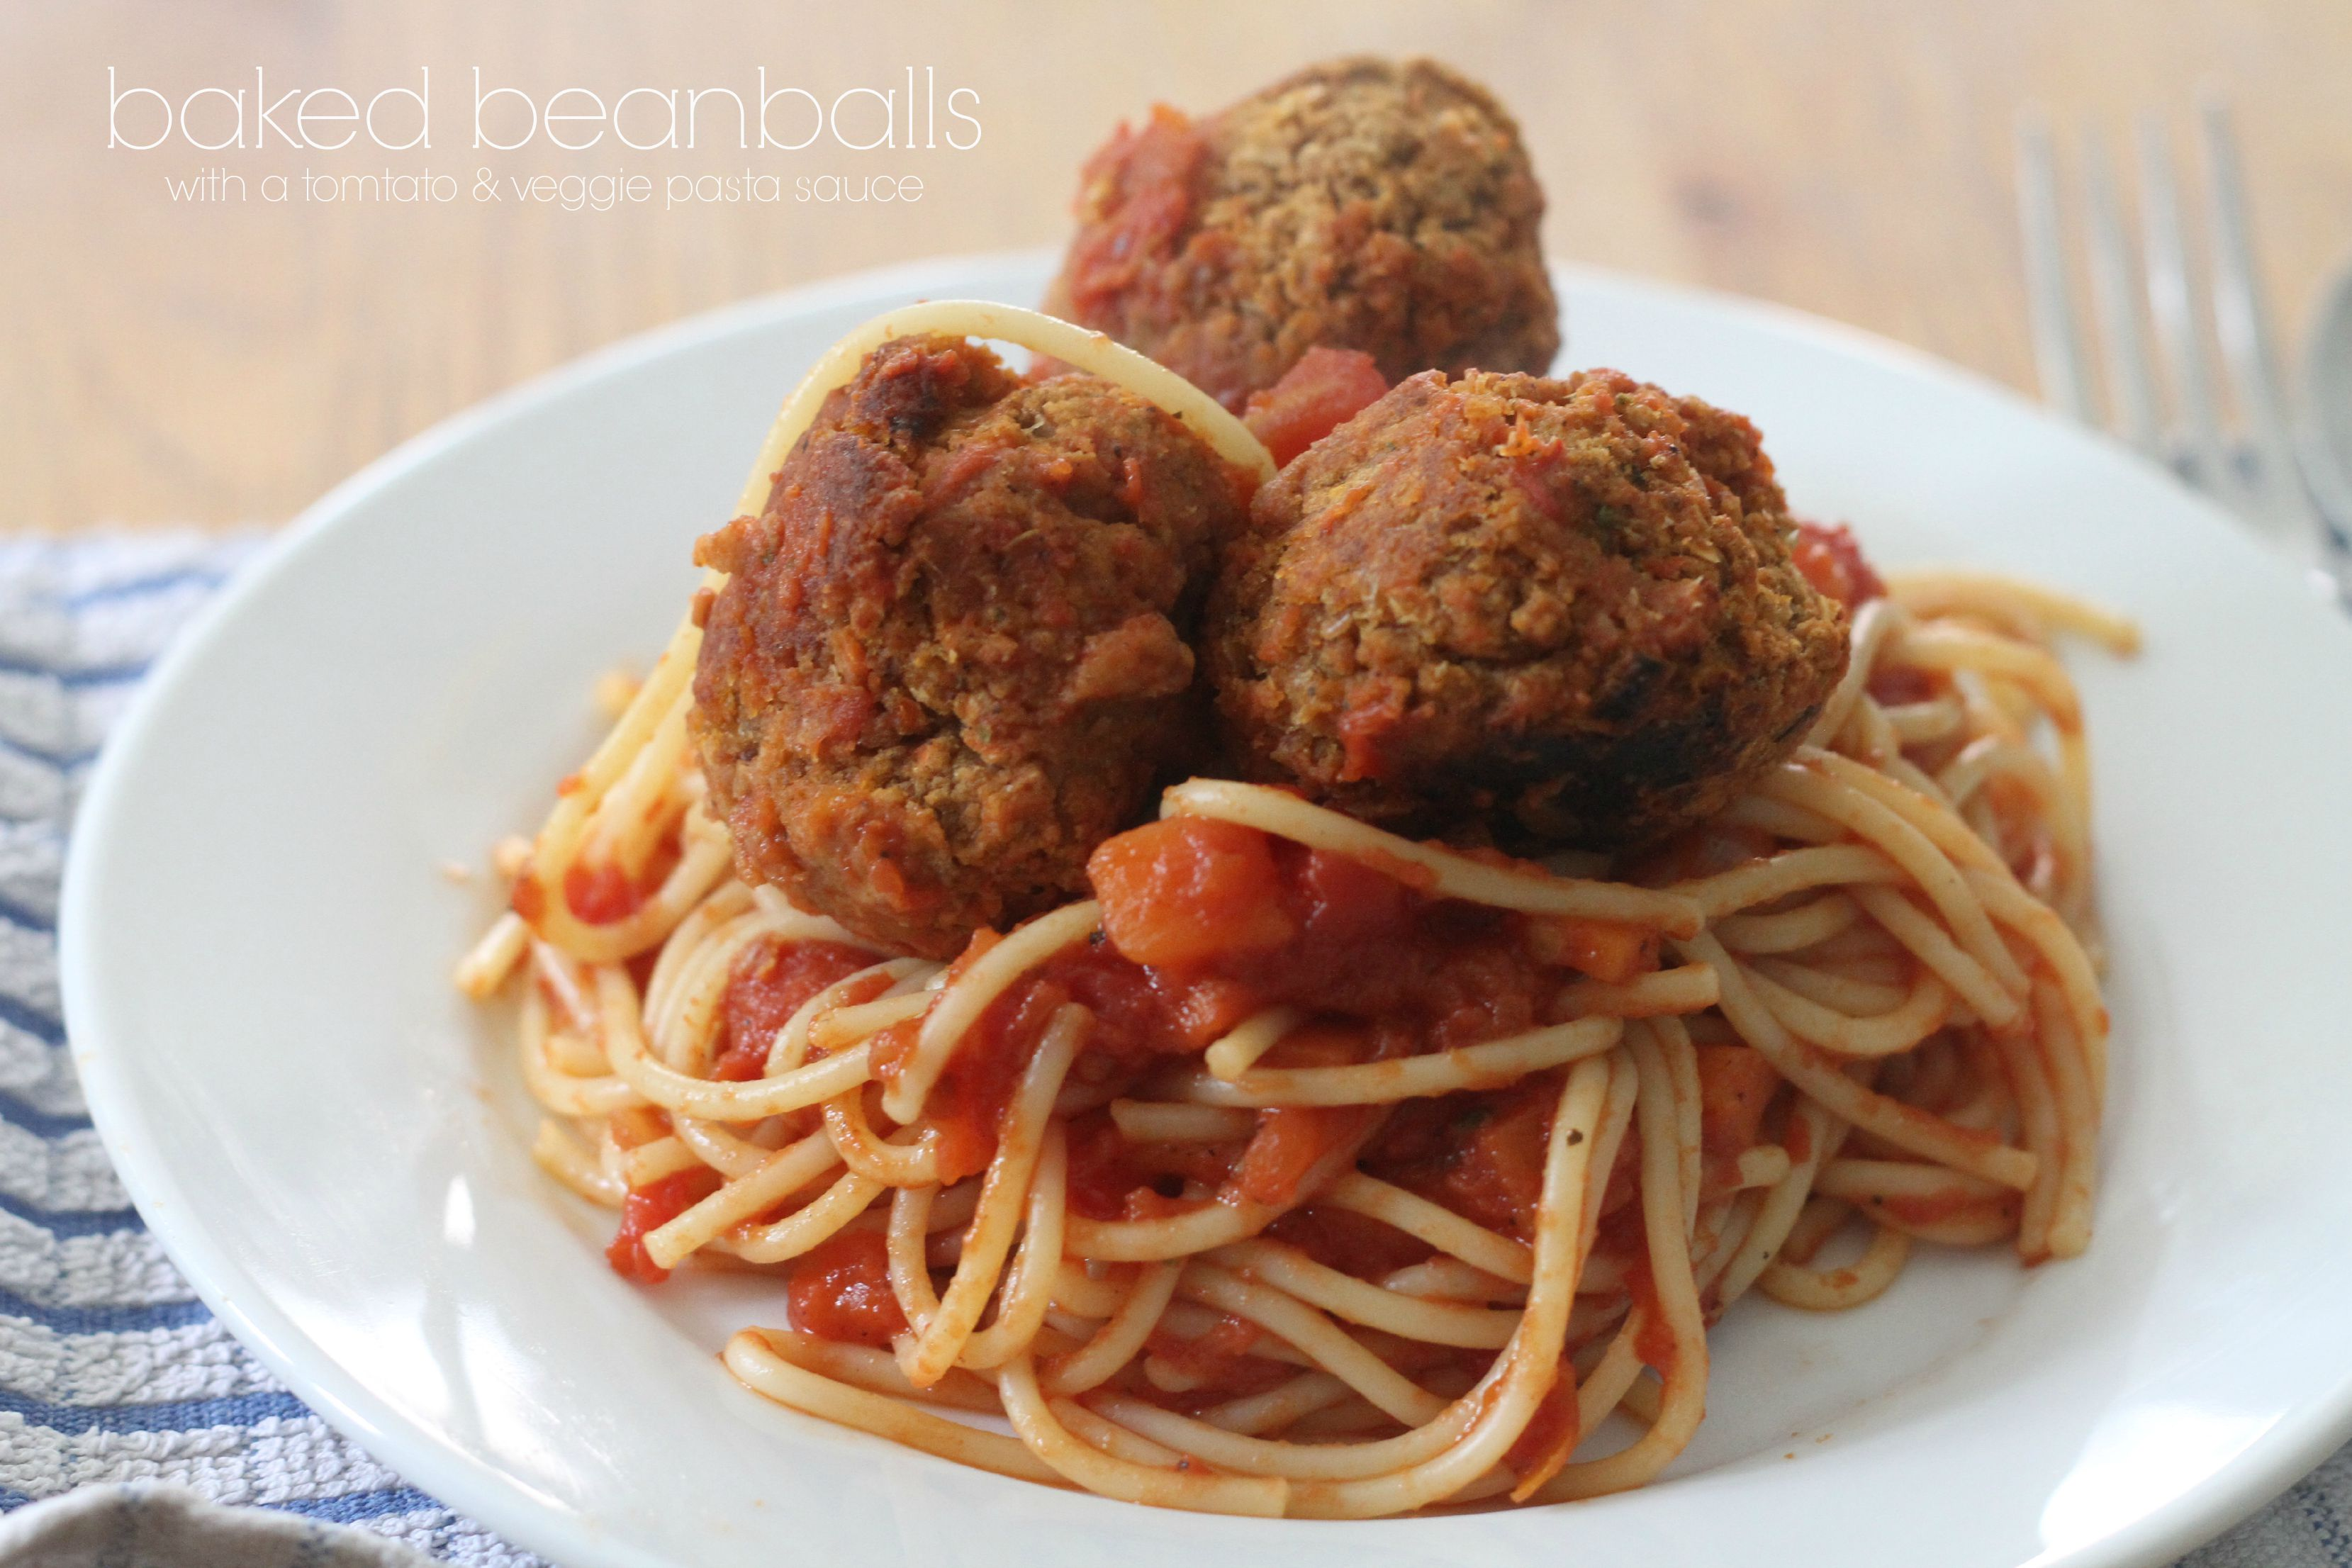 Baked Beanballs with a tomato & veggie pasta sauce - Mummy Mishaps